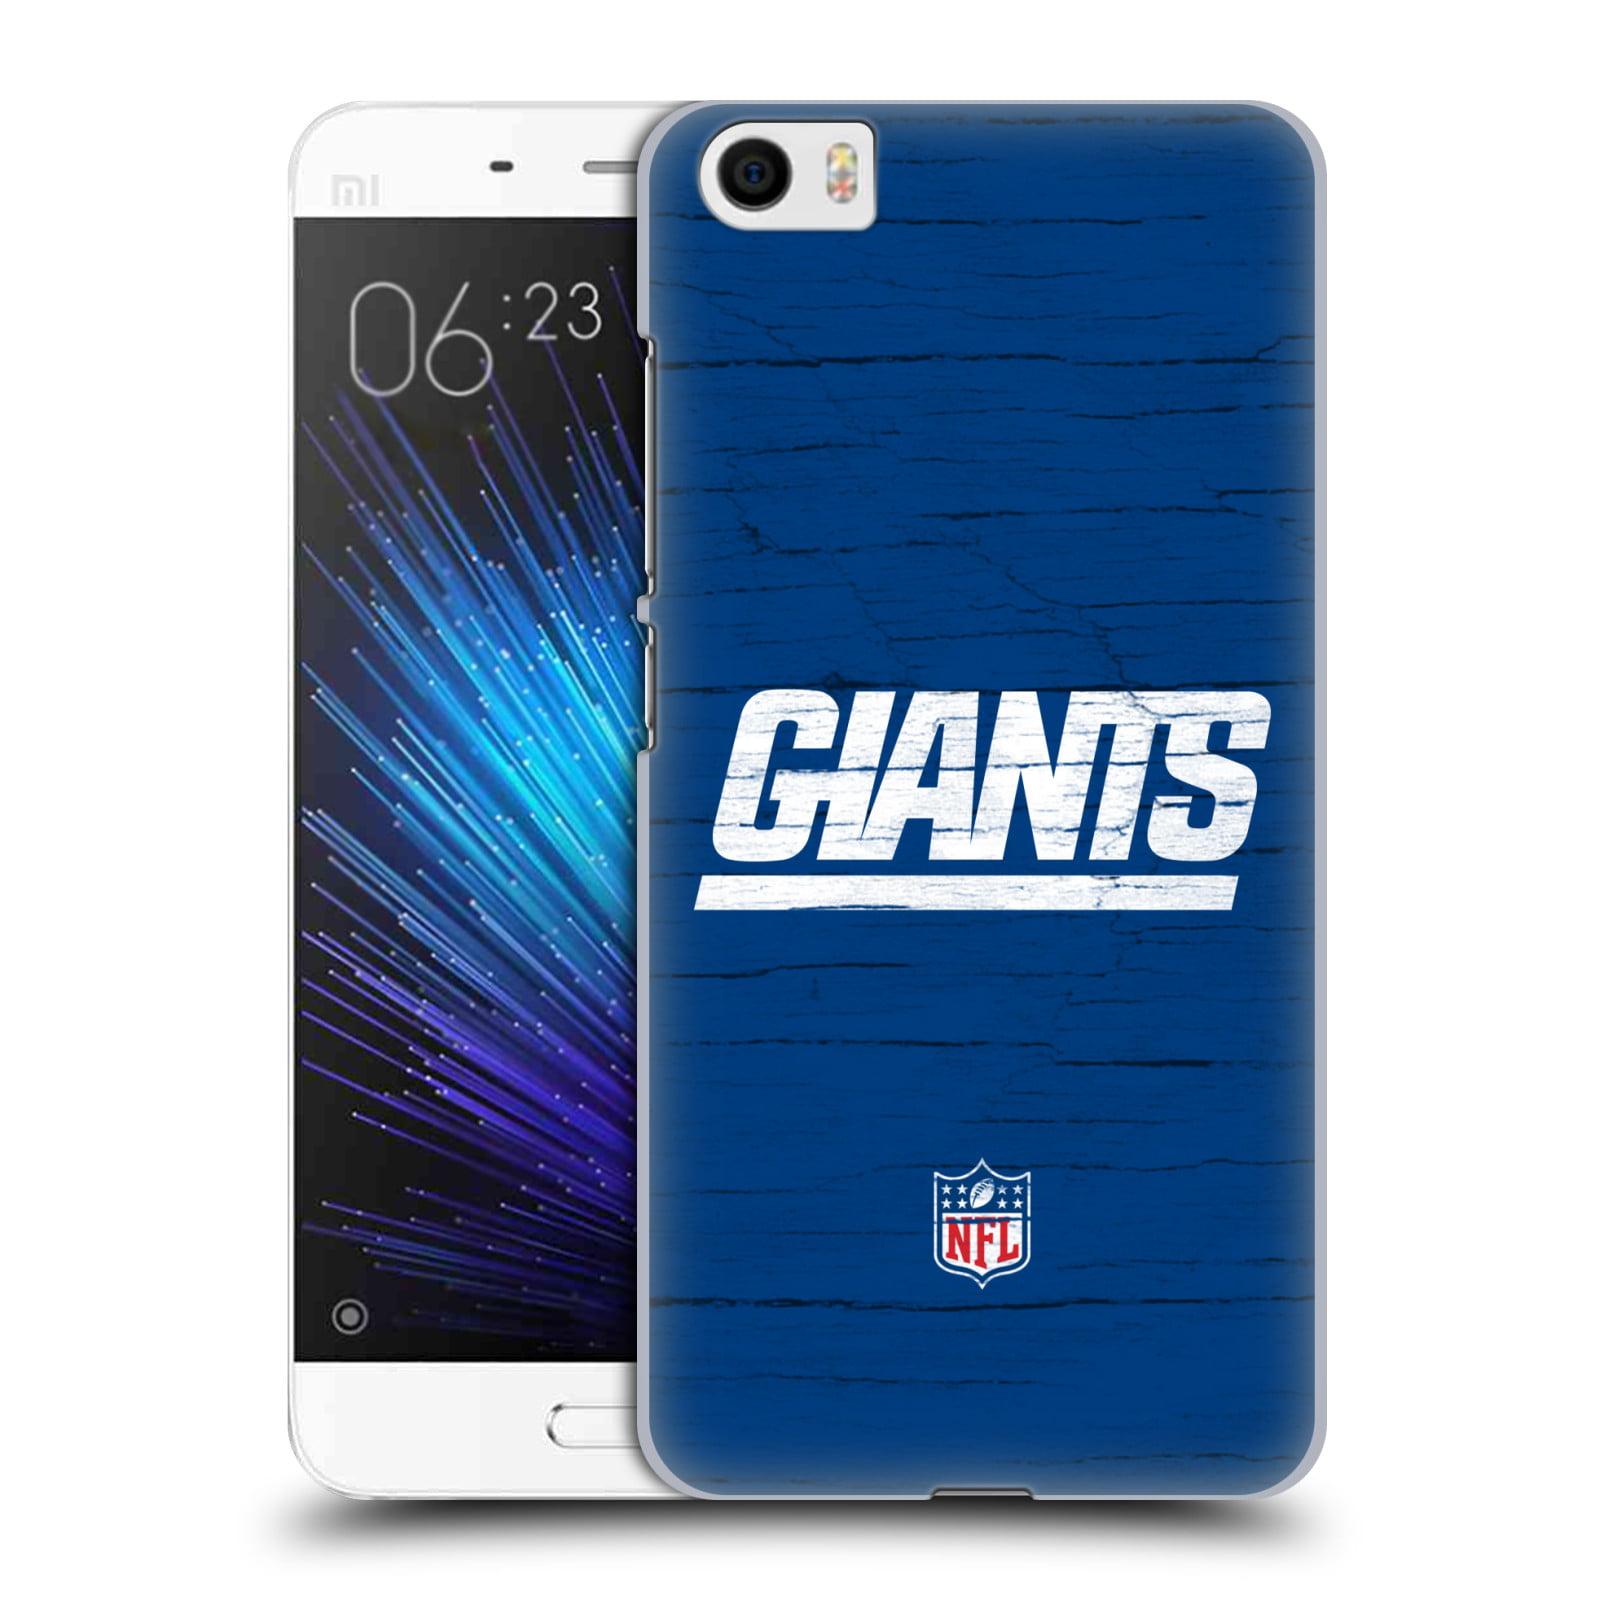 OFFICIAL NFL NEW YORK GIANTS LOGO HARD BACK CASE FOR XIAOMI PHONES